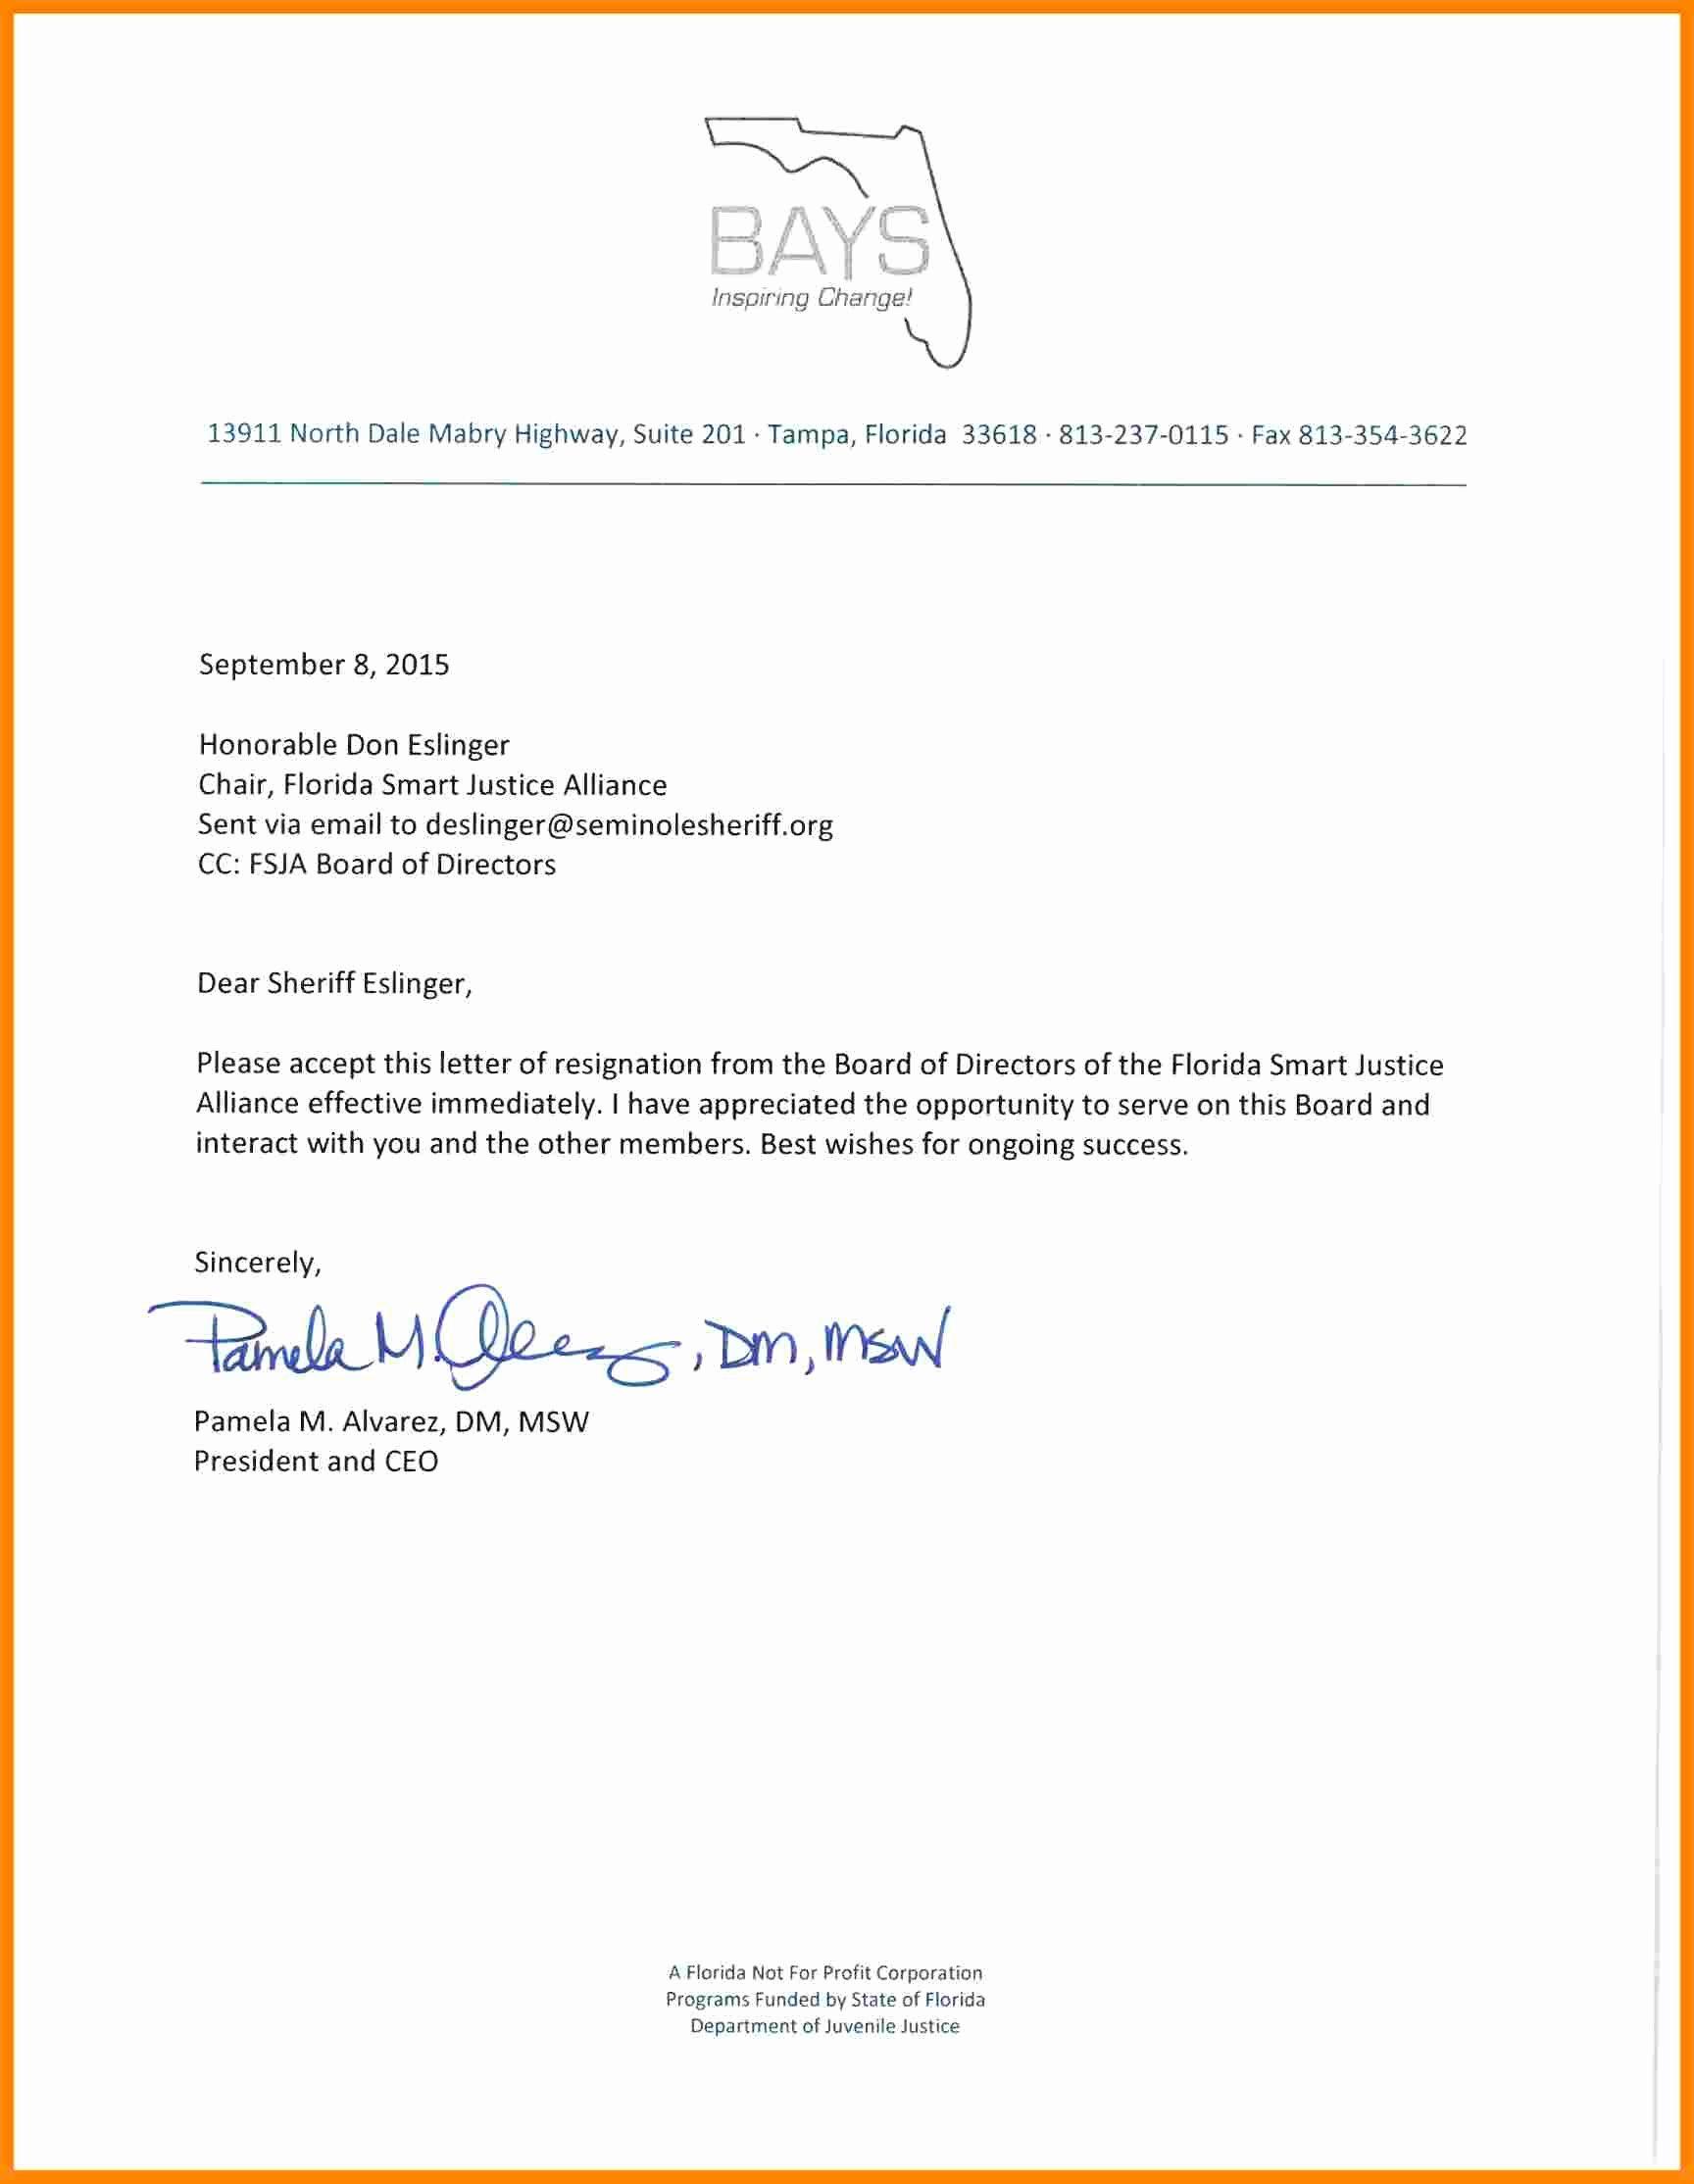 Resignation Letter Volunteer organization Best Of 5 Non Profit Board Resignation Letter Sample